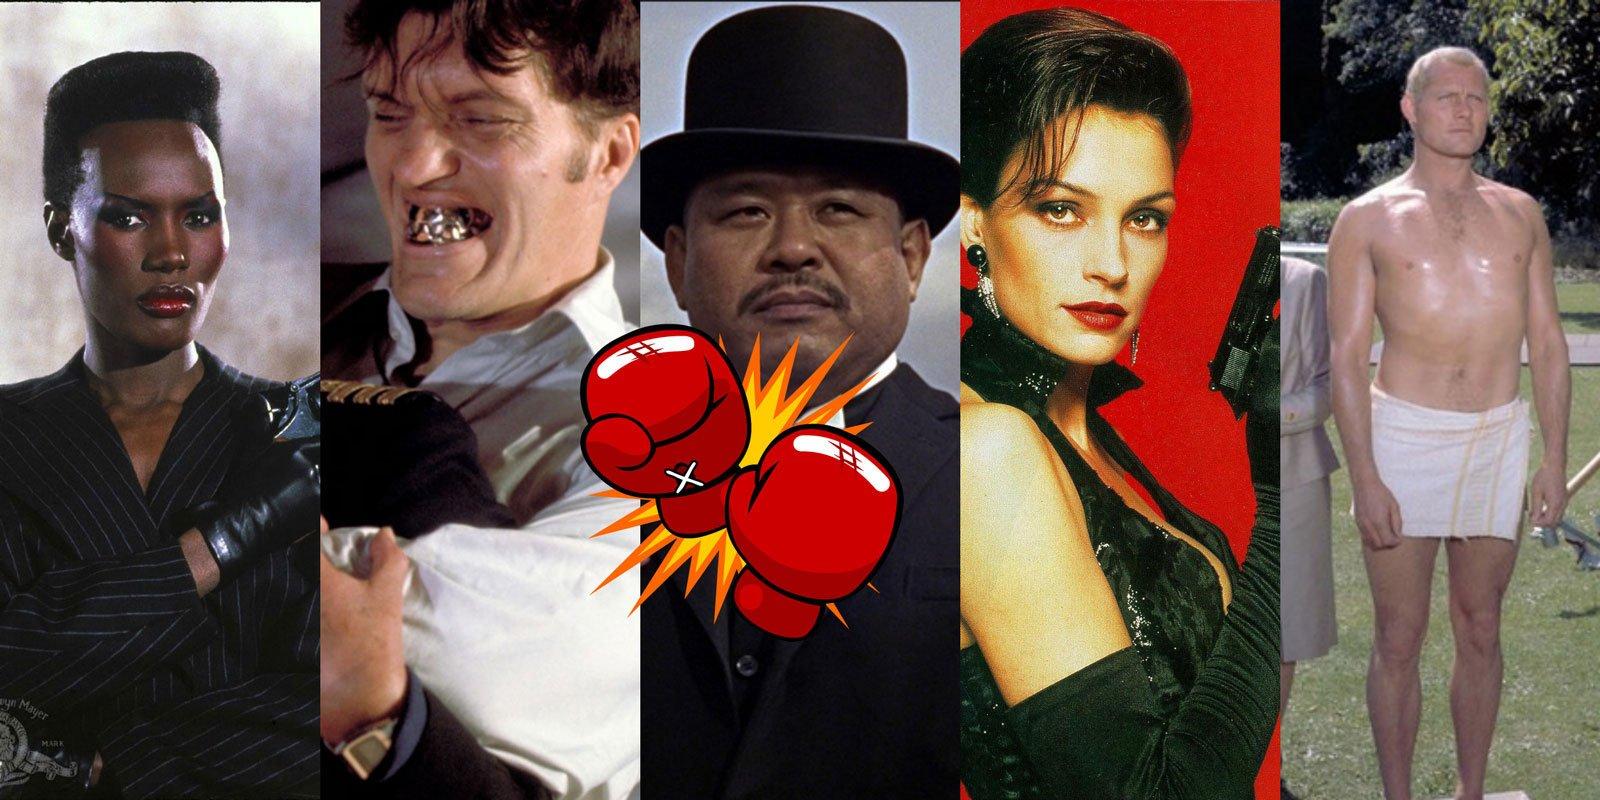 Goofy Bond Henchmen Film Fight